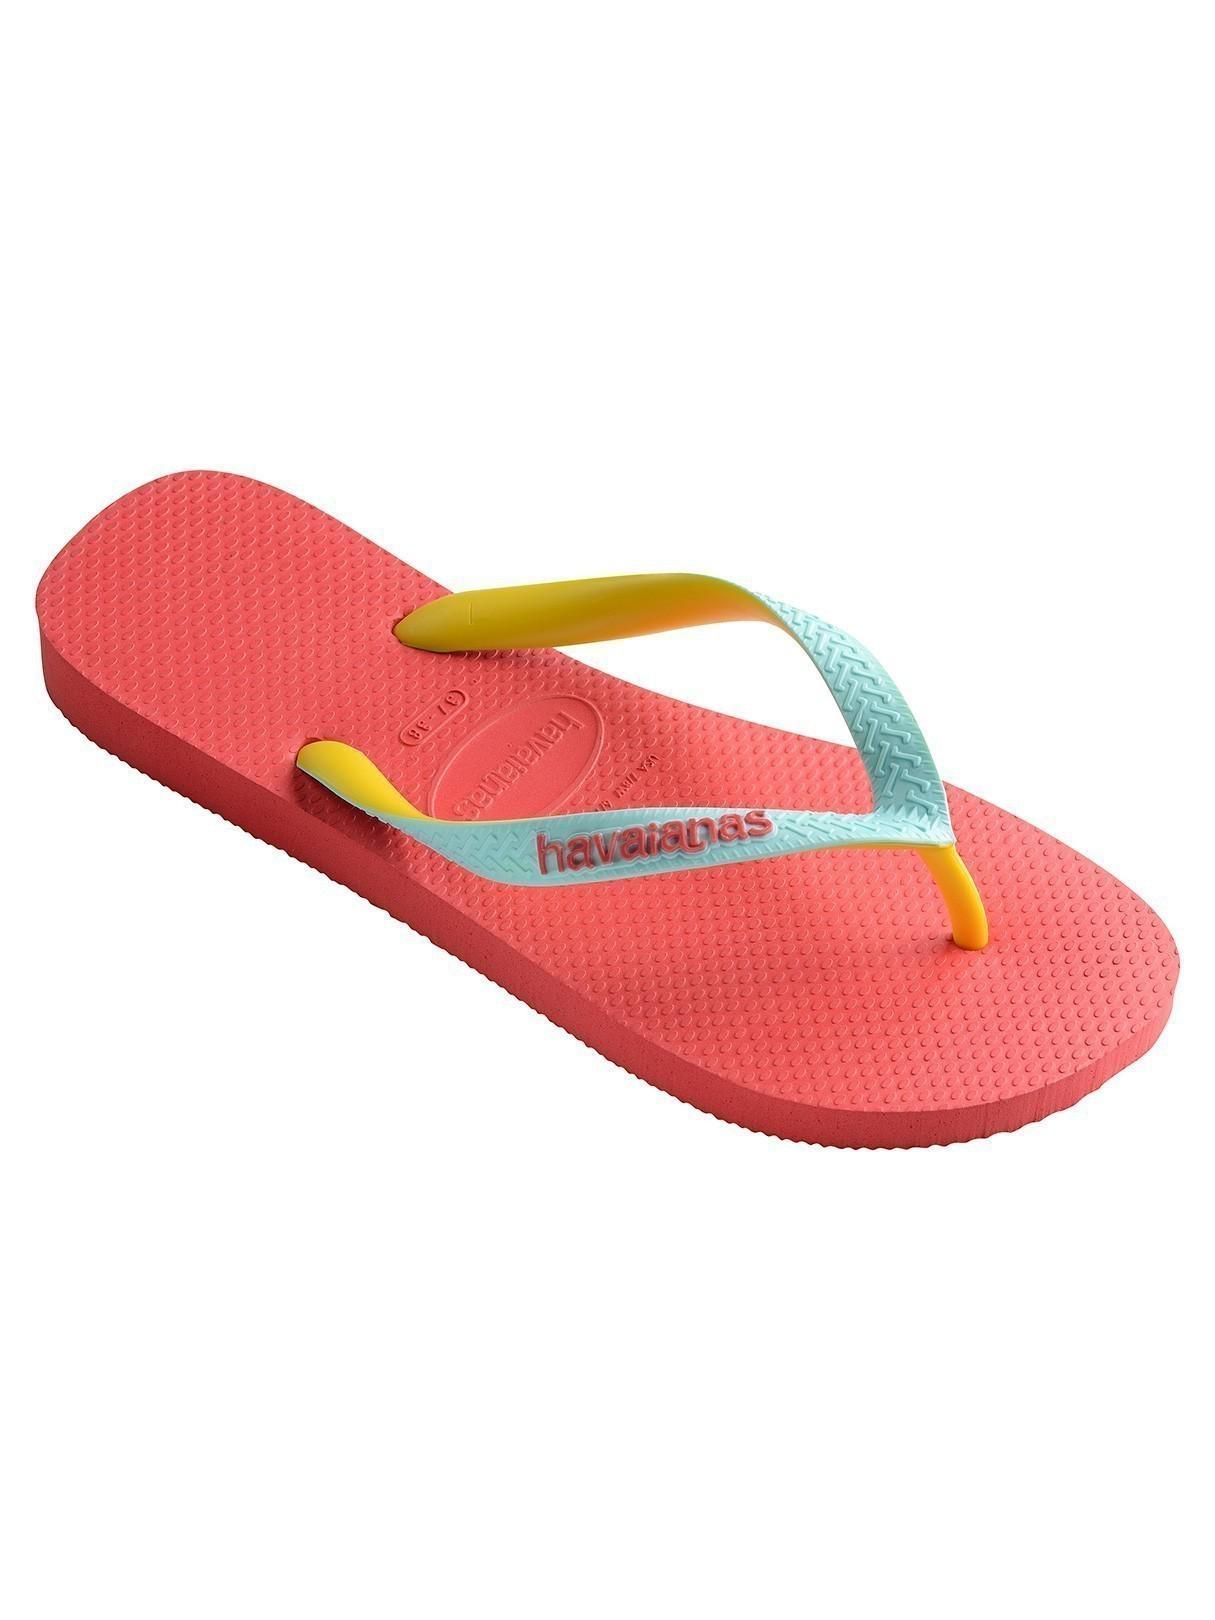 5c8c31f35c4ef Lyst - Havaianas Coralnew Top Mix Flip Flops